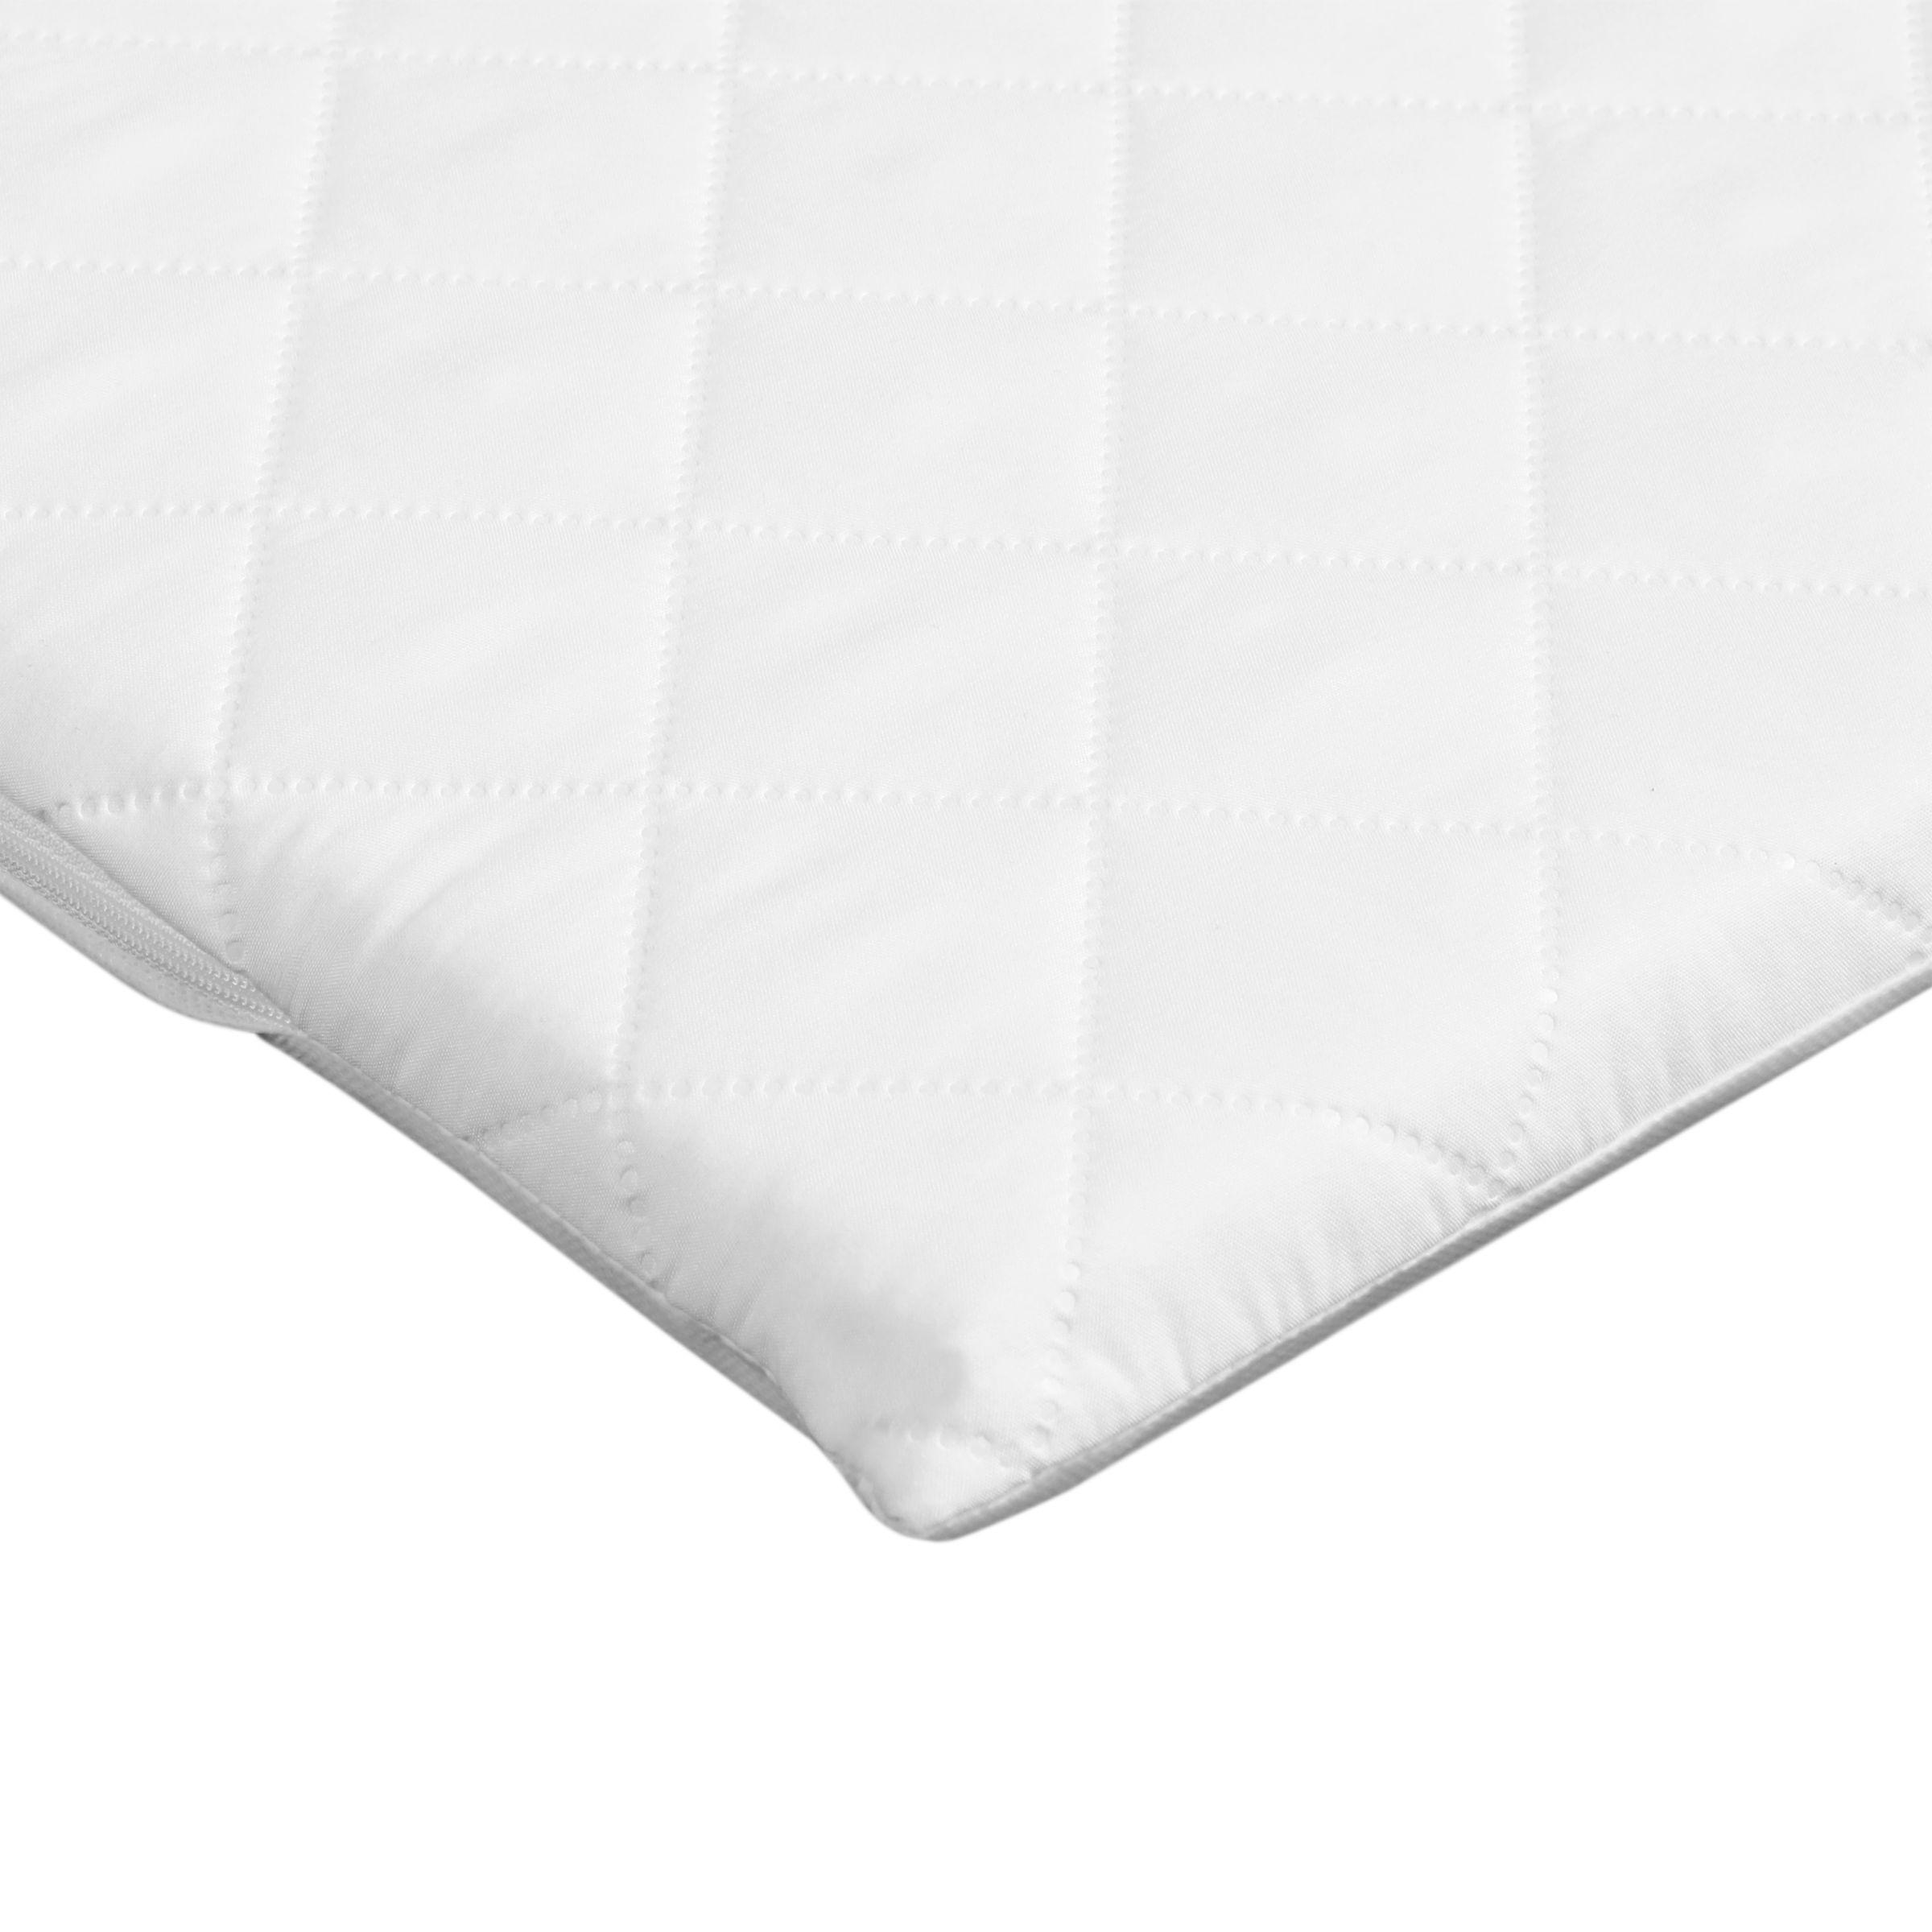 John Lewis & Partners Premium Foam Crib Mattress, 89 x 38cm